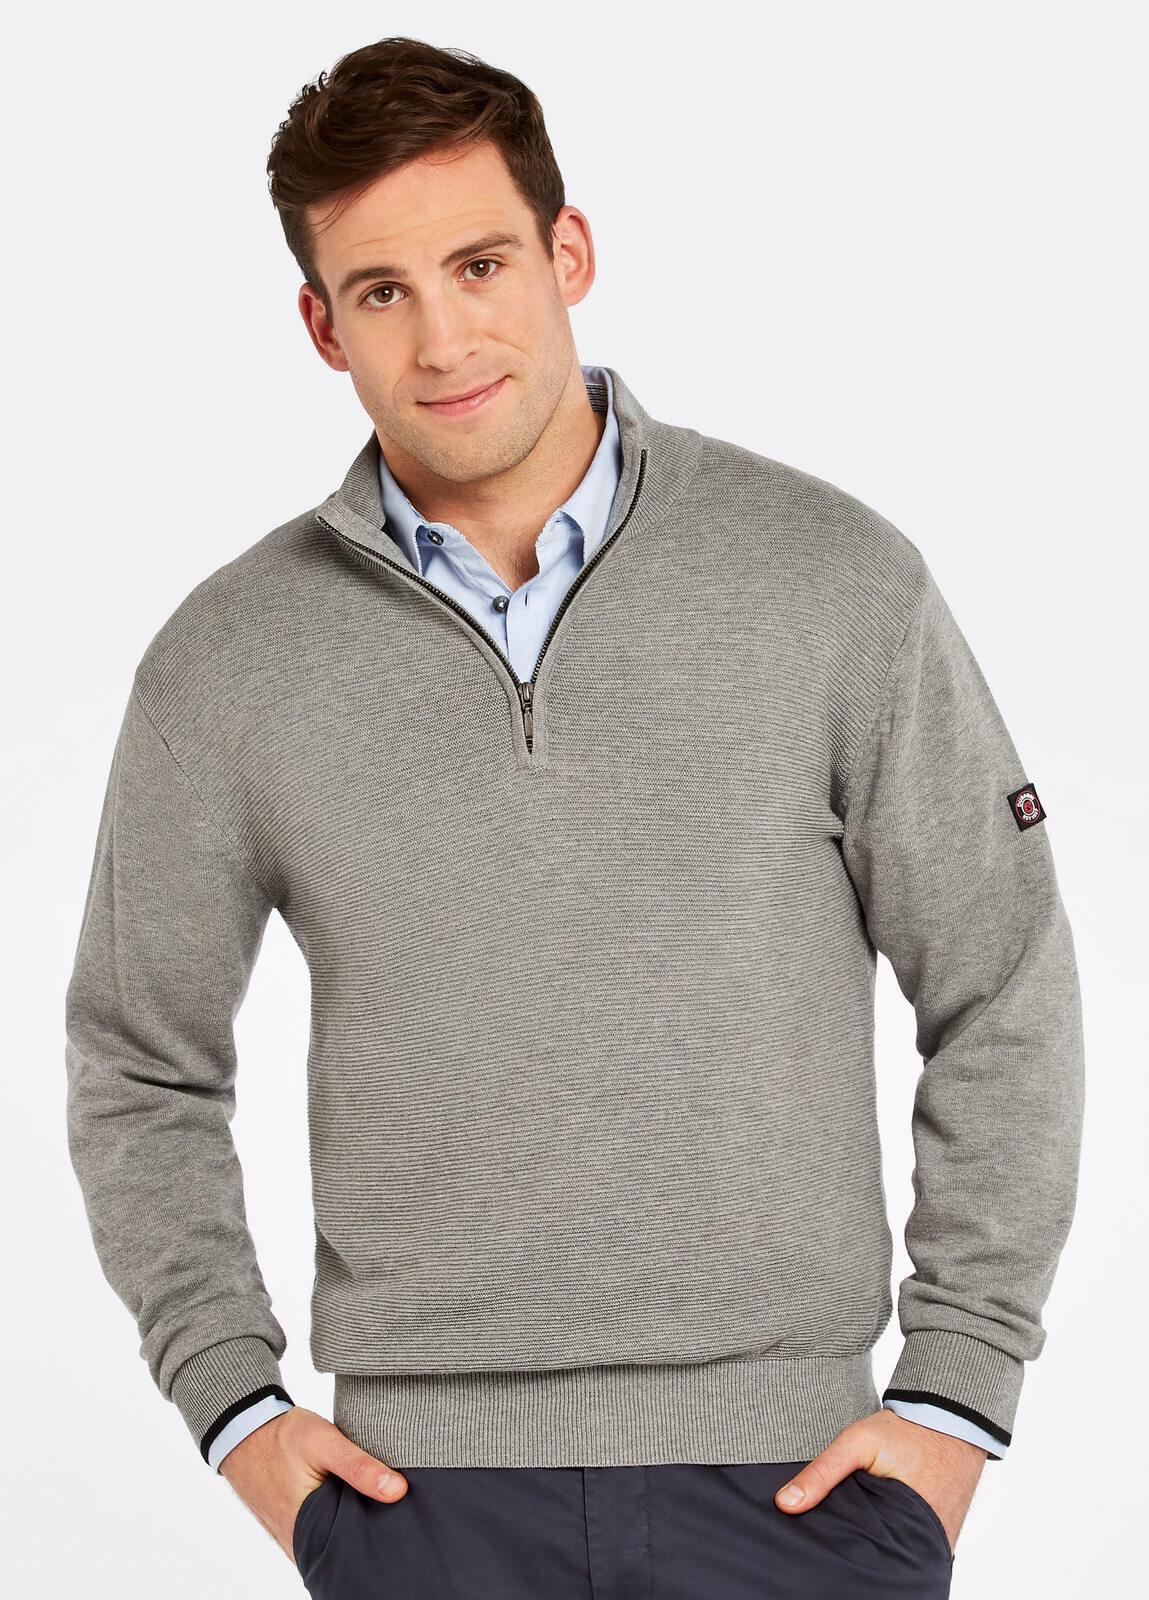 Dubarry_Brosna_Zip_Neck_Sweater_Grey_on_model